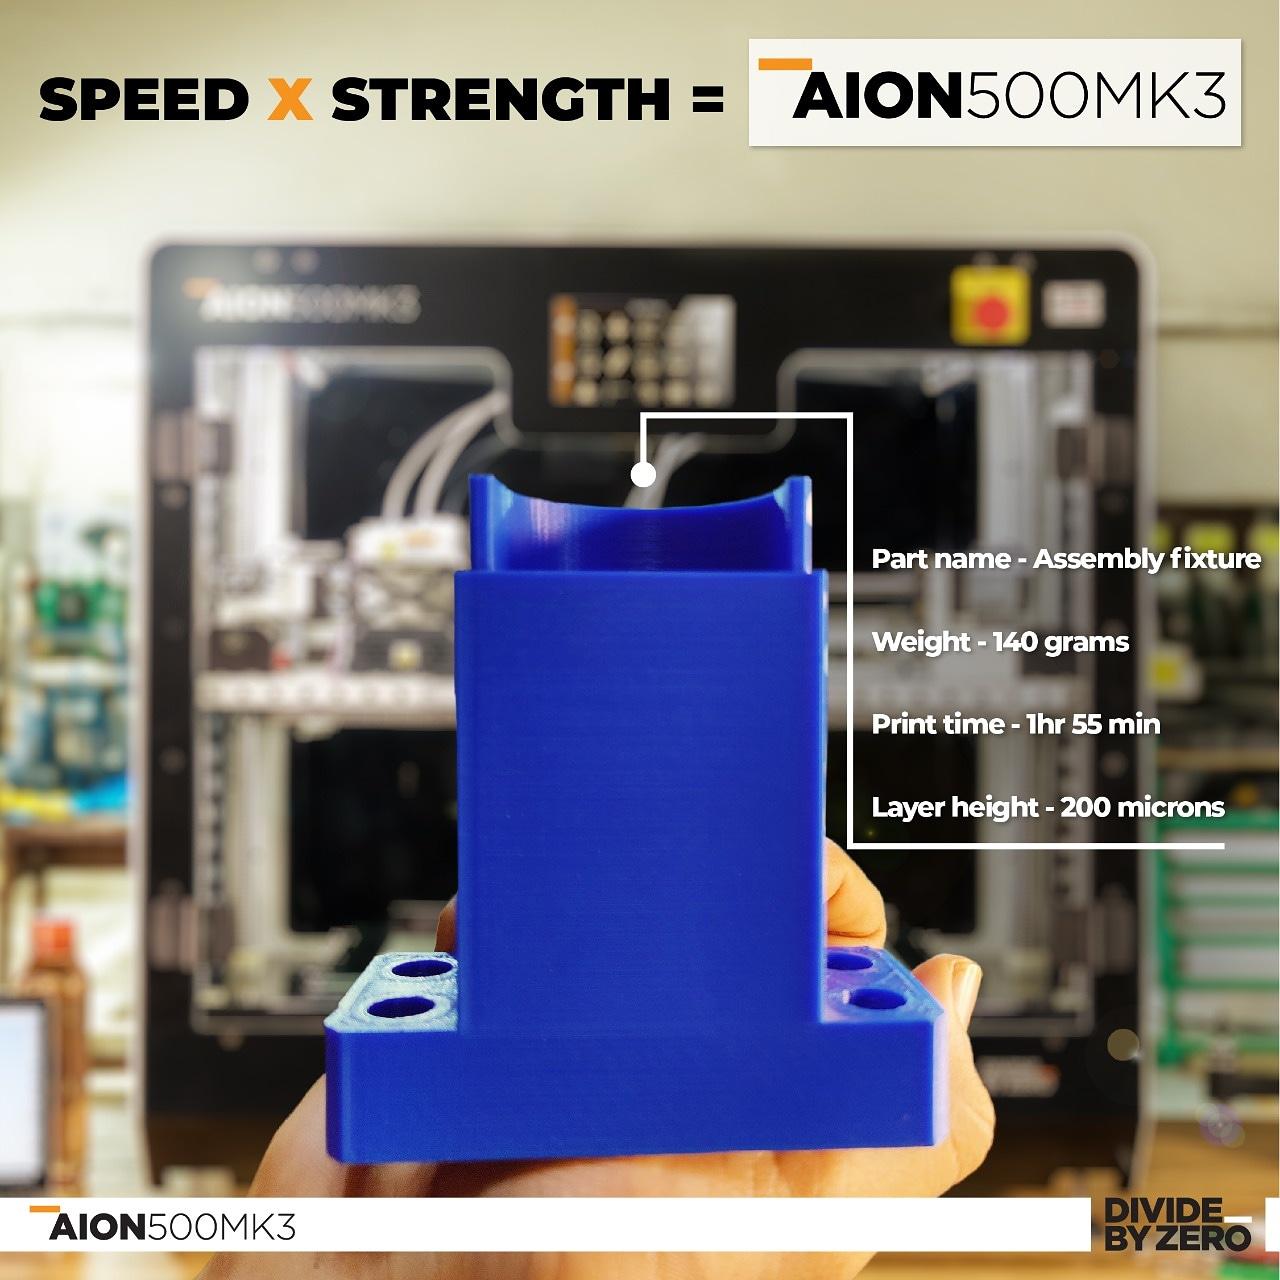 high-speed 3D printing